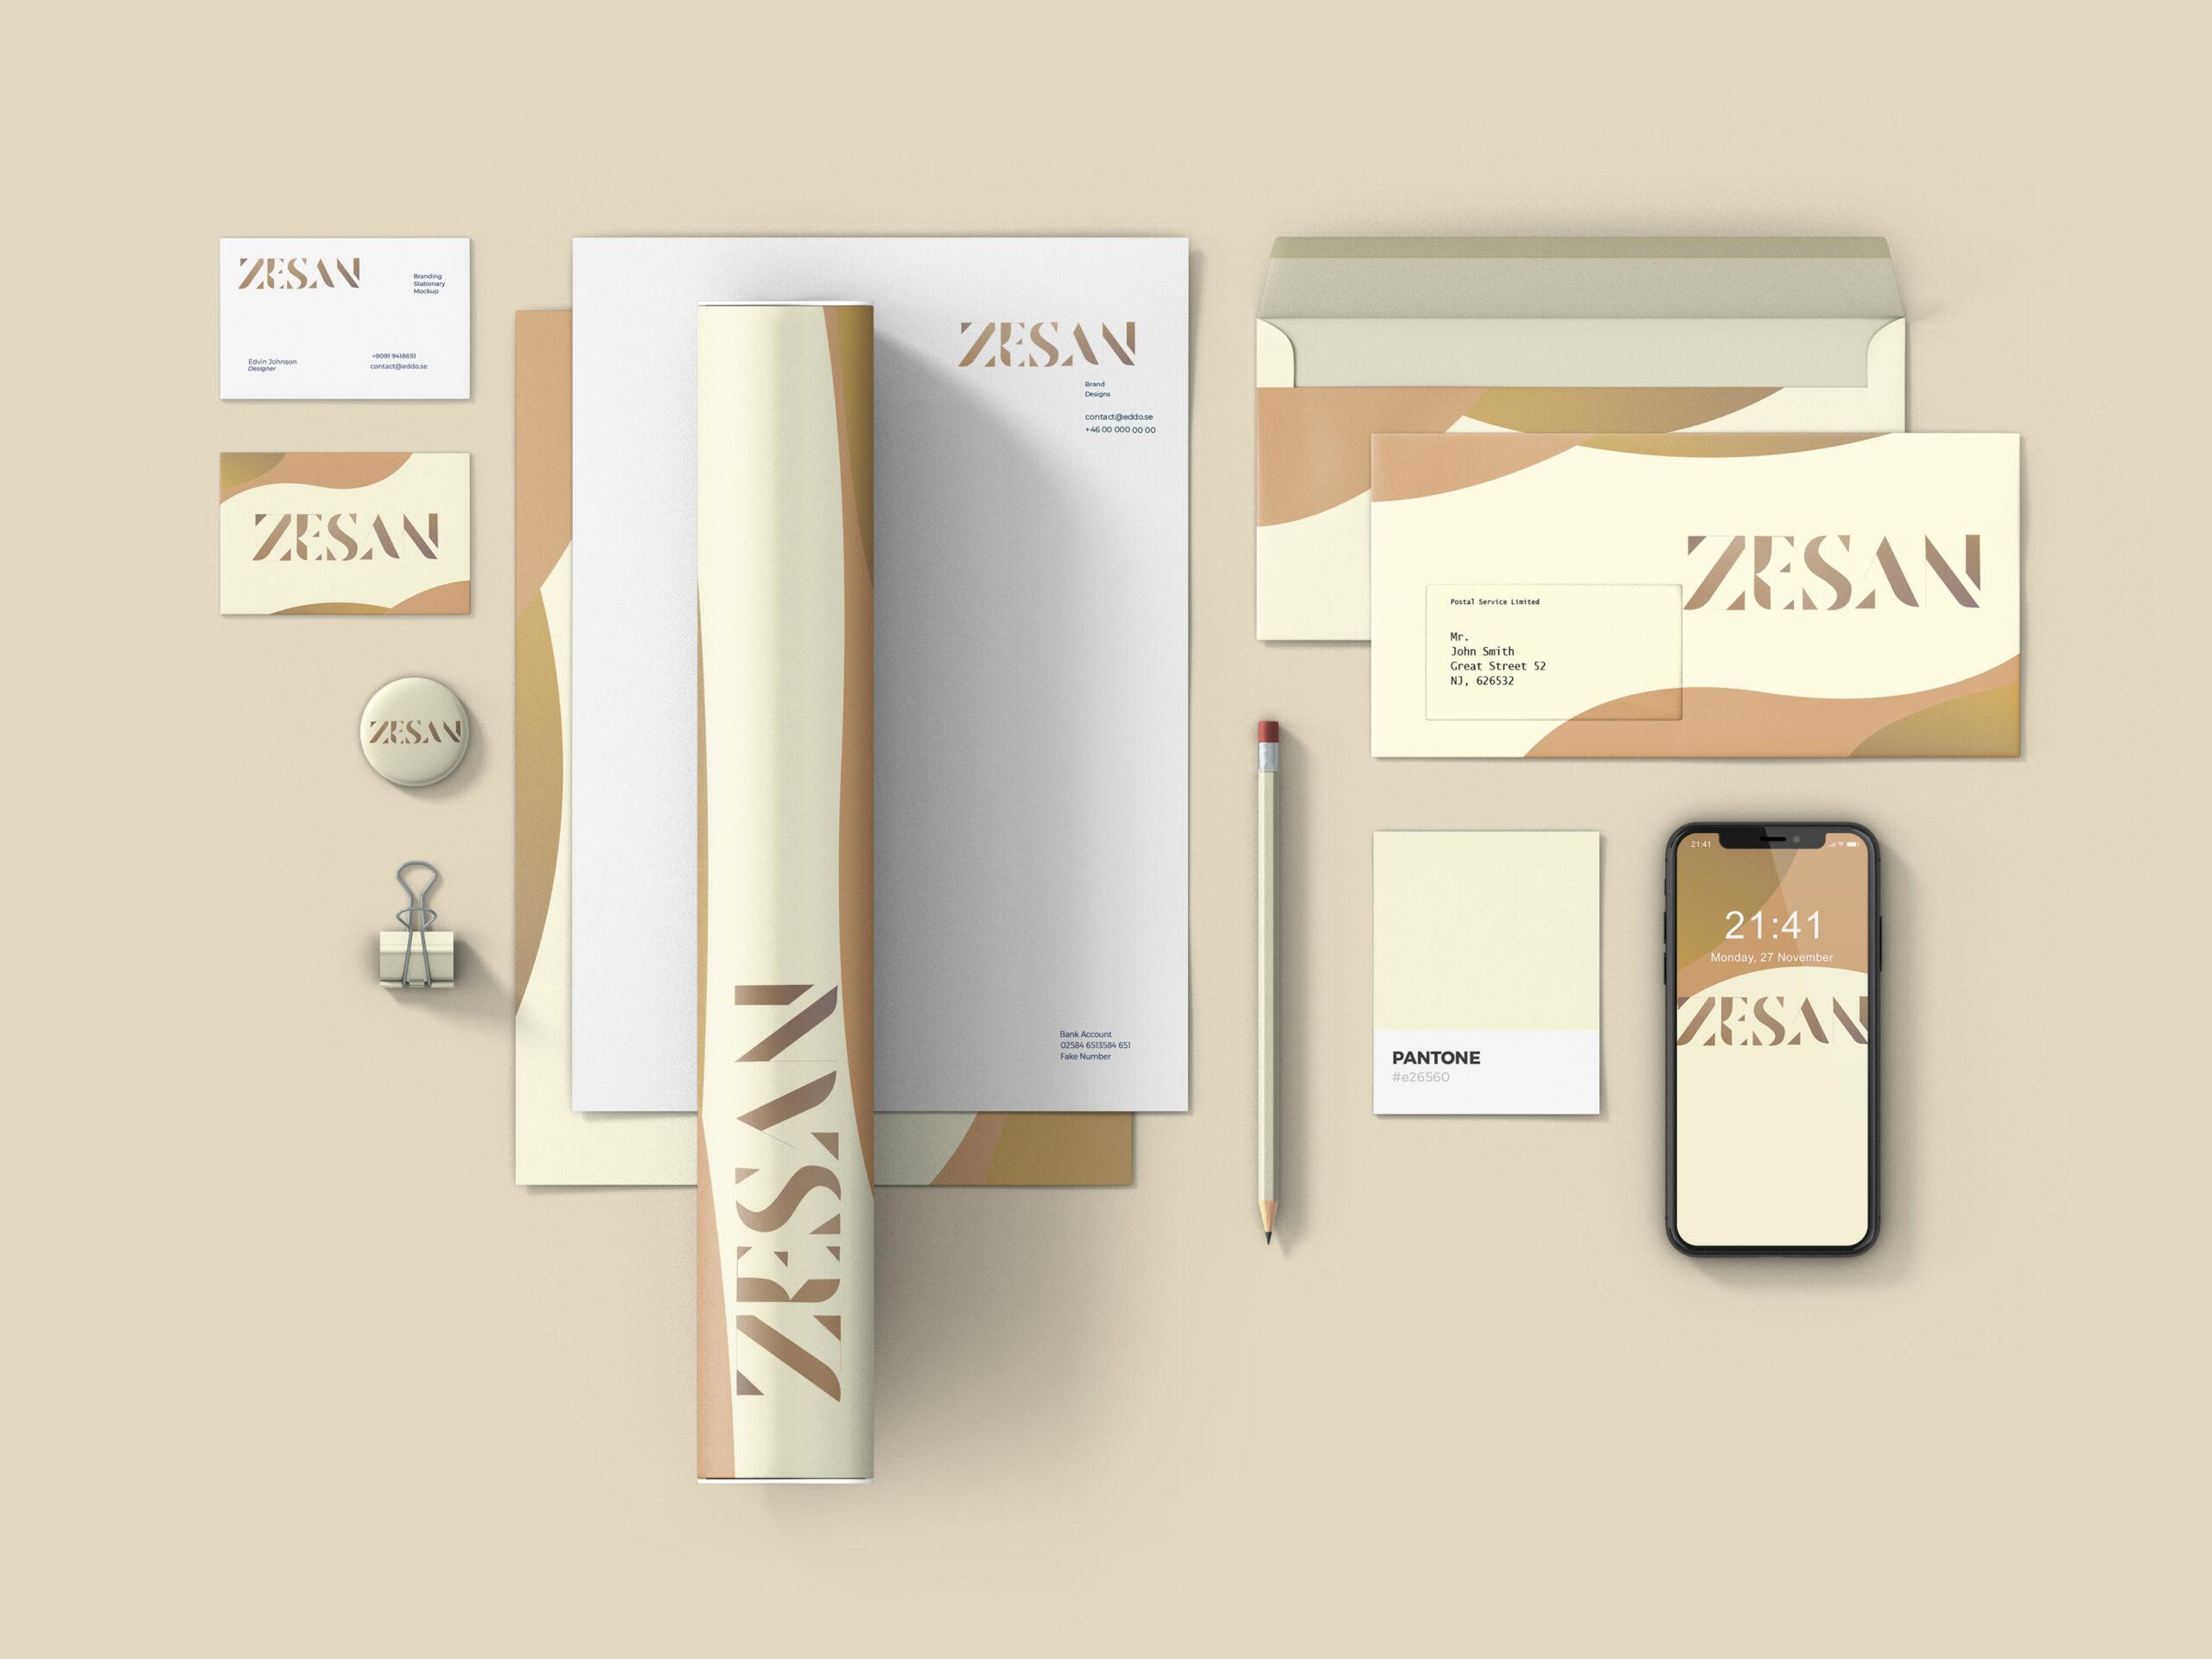 Zesan